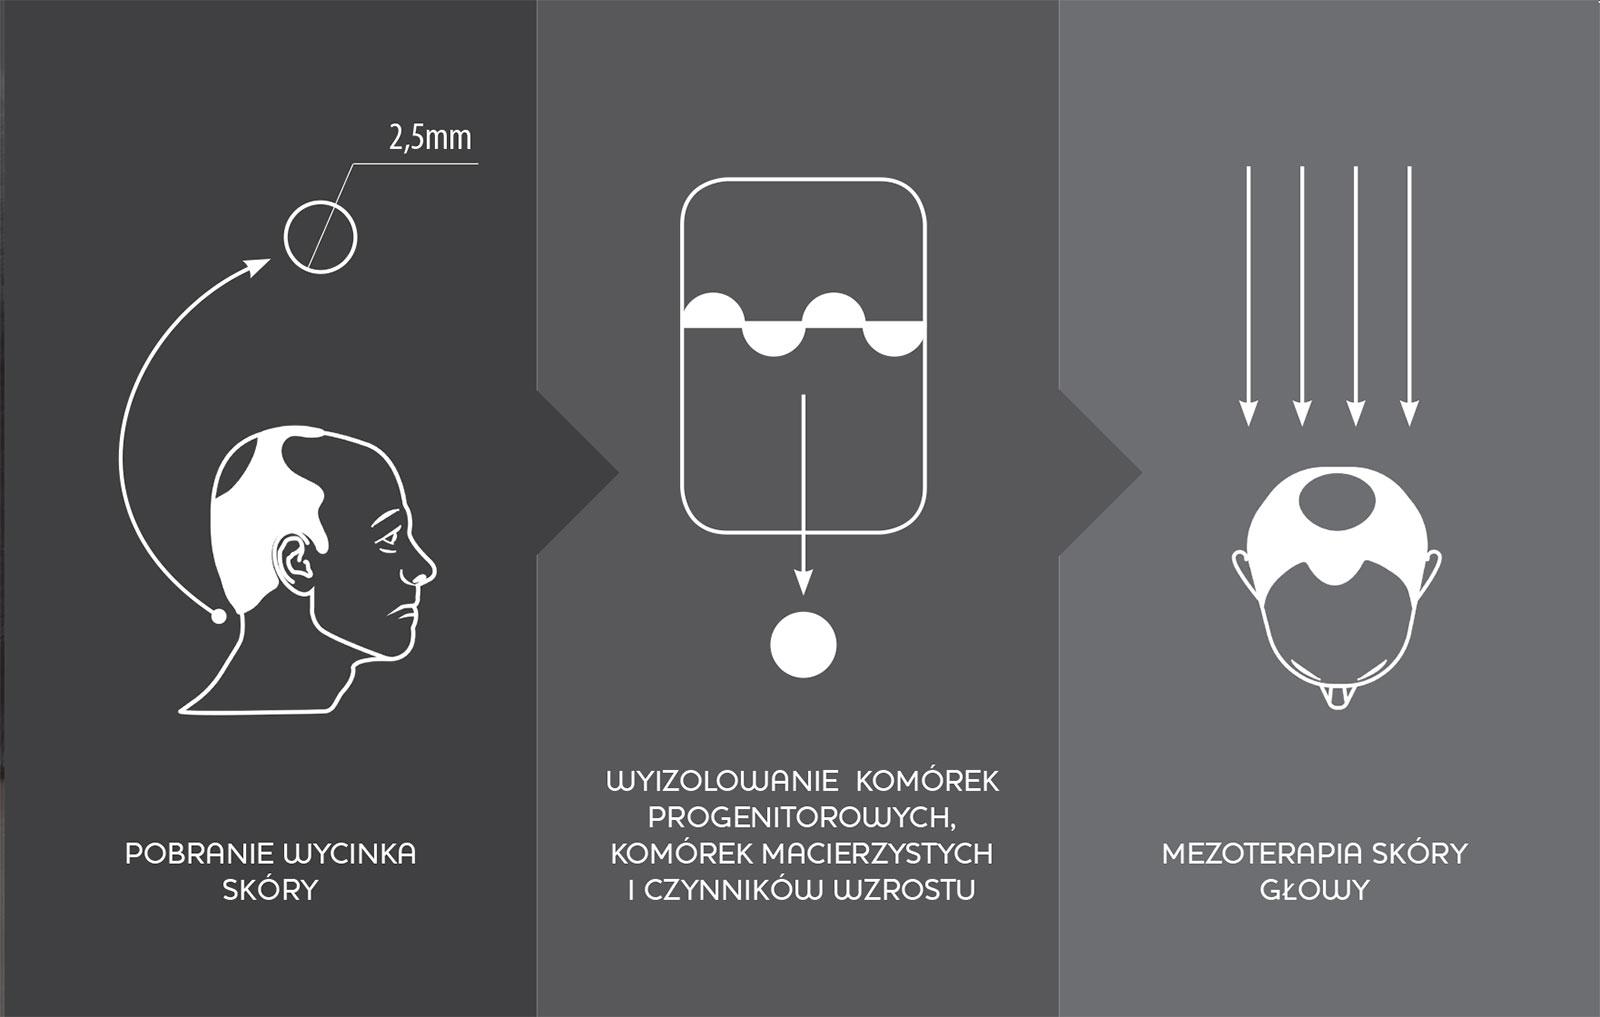 regenera activa z - WŁOSY - REGENERA ACTIVA